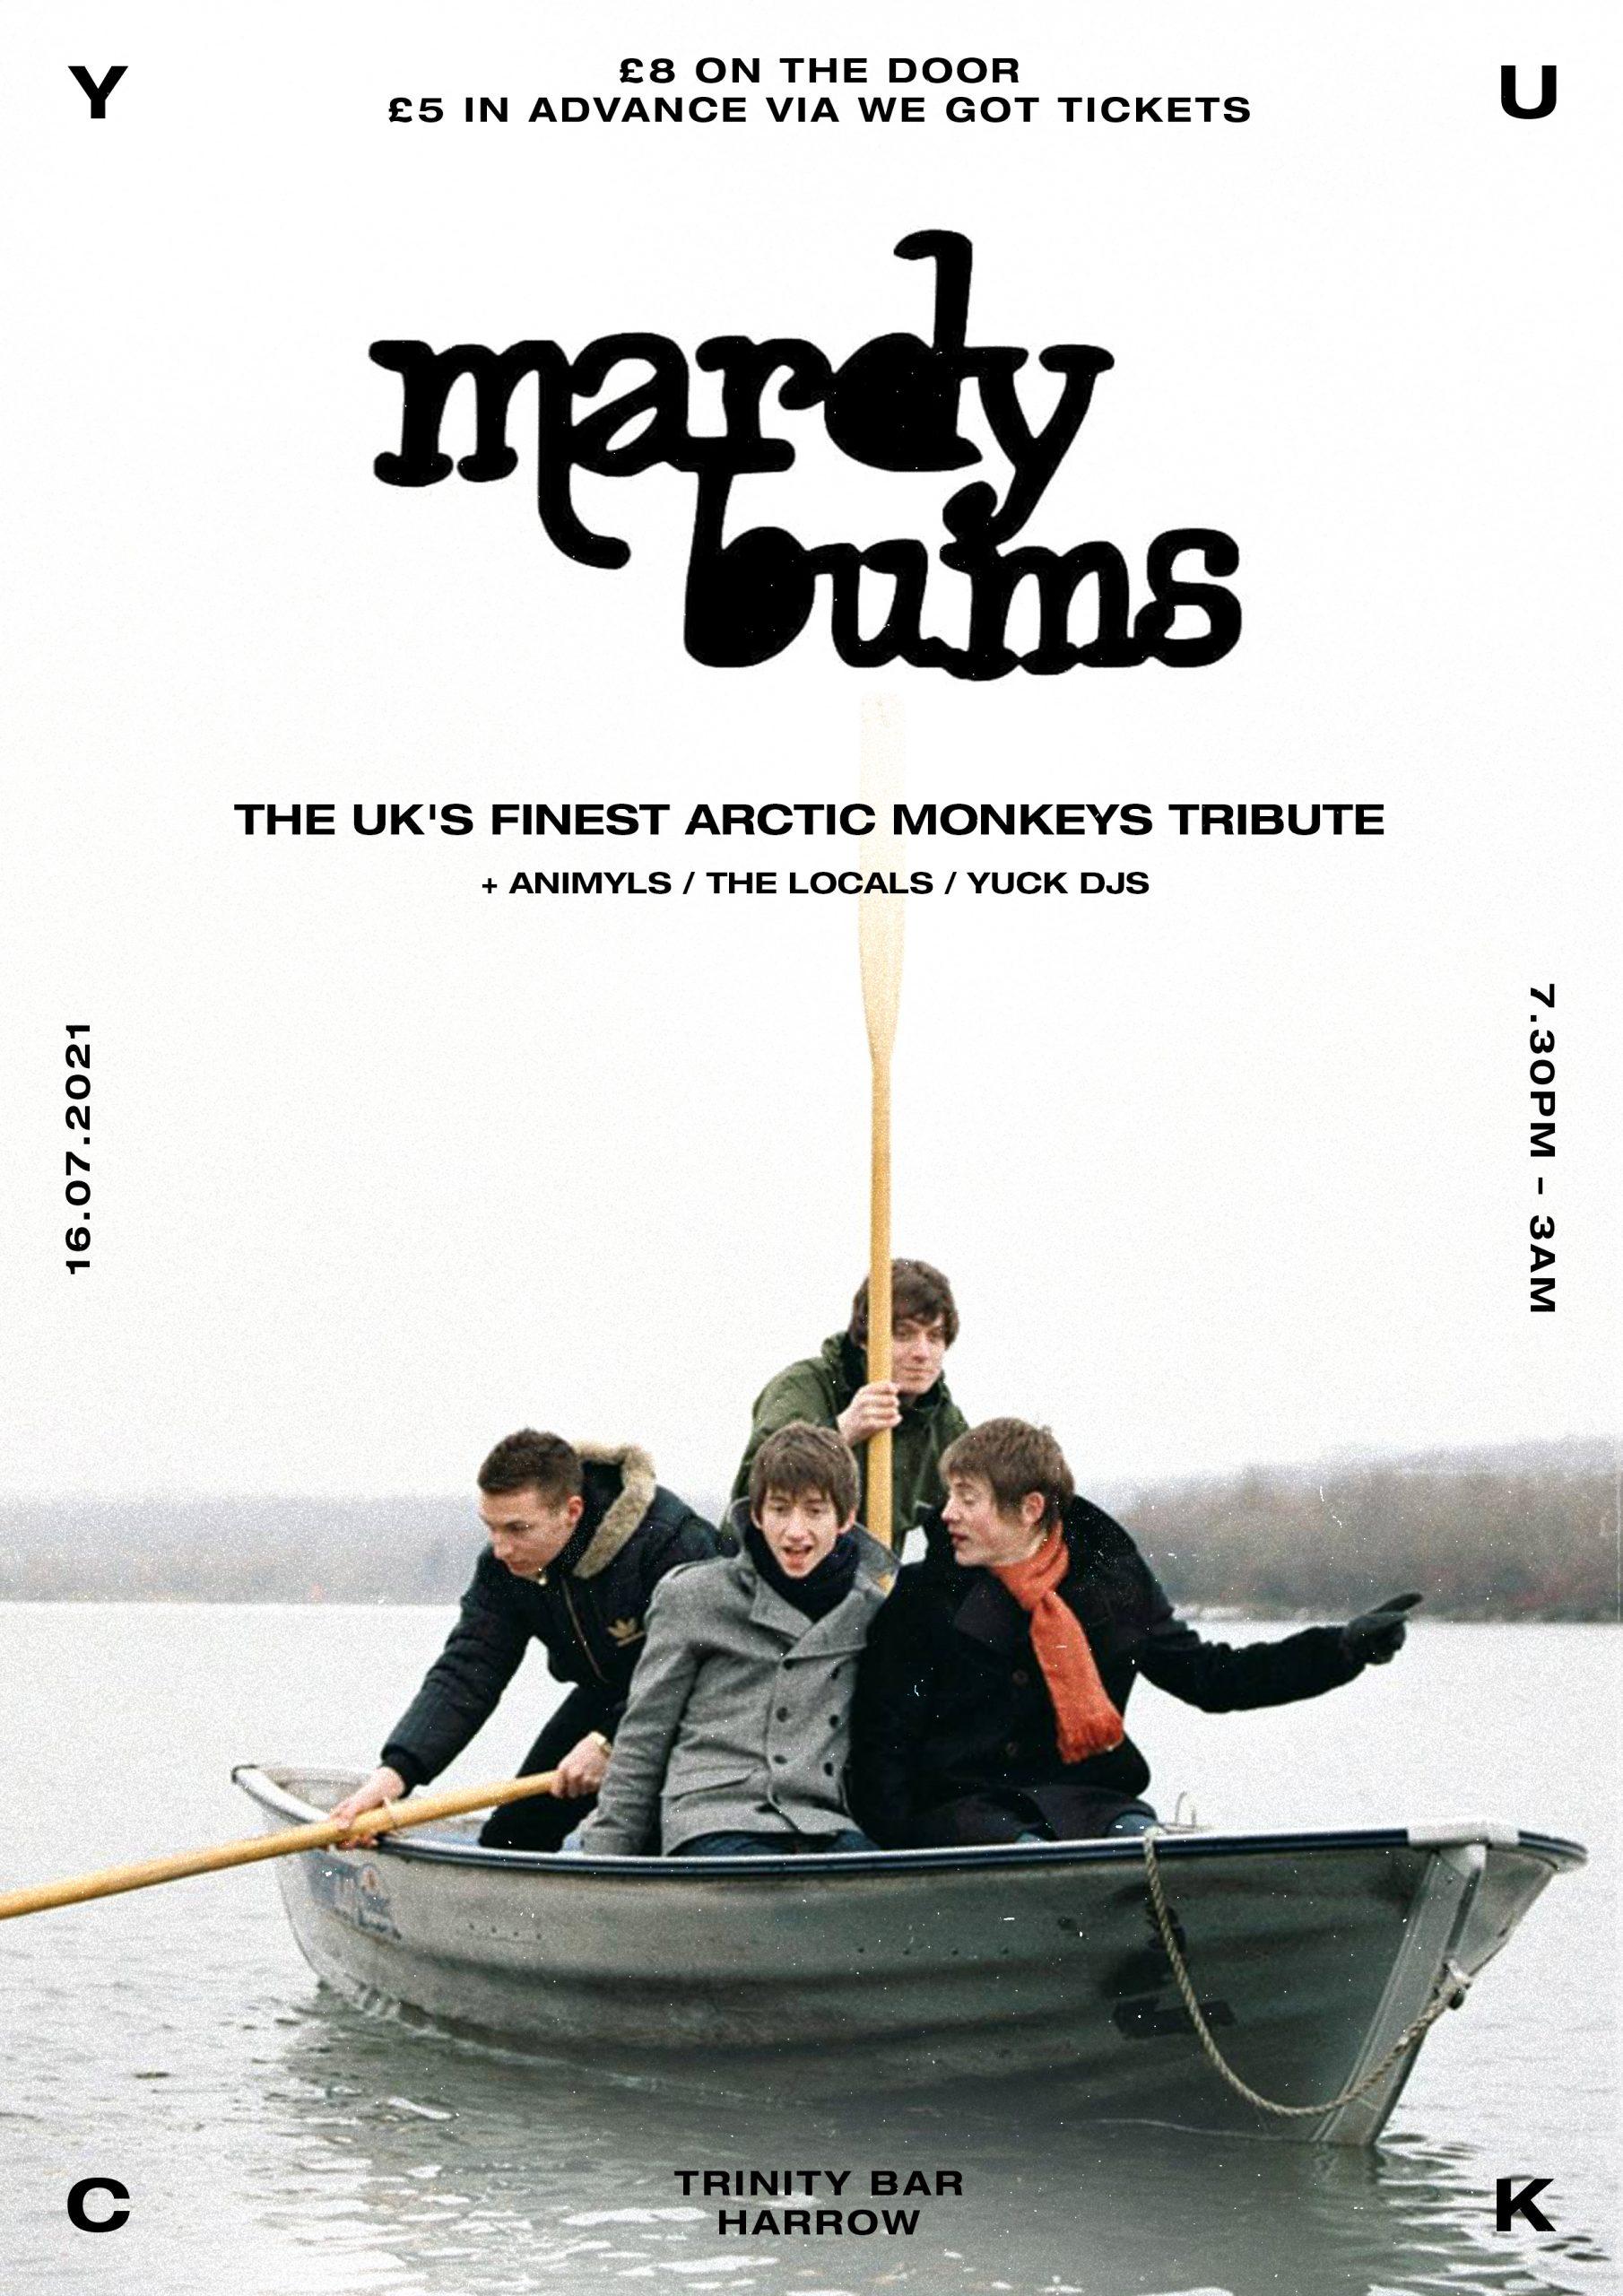 Mardy Bums (Arctic Monkeys Tribute) + Animyls + The Locals + Yuck DJs